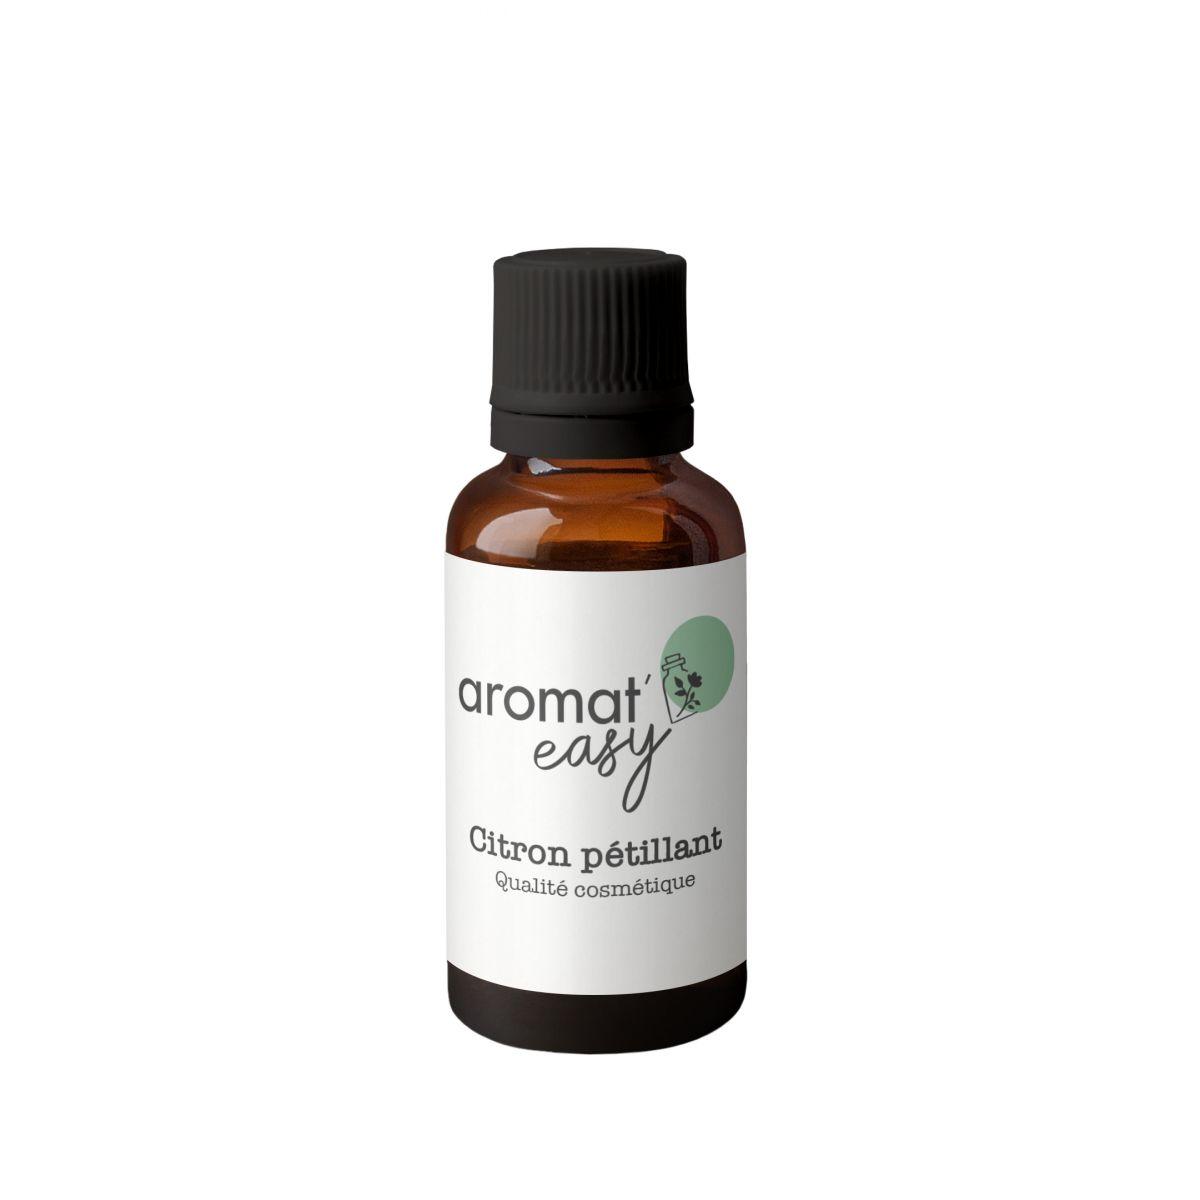 Fragrance Naturelle Citron pétillant